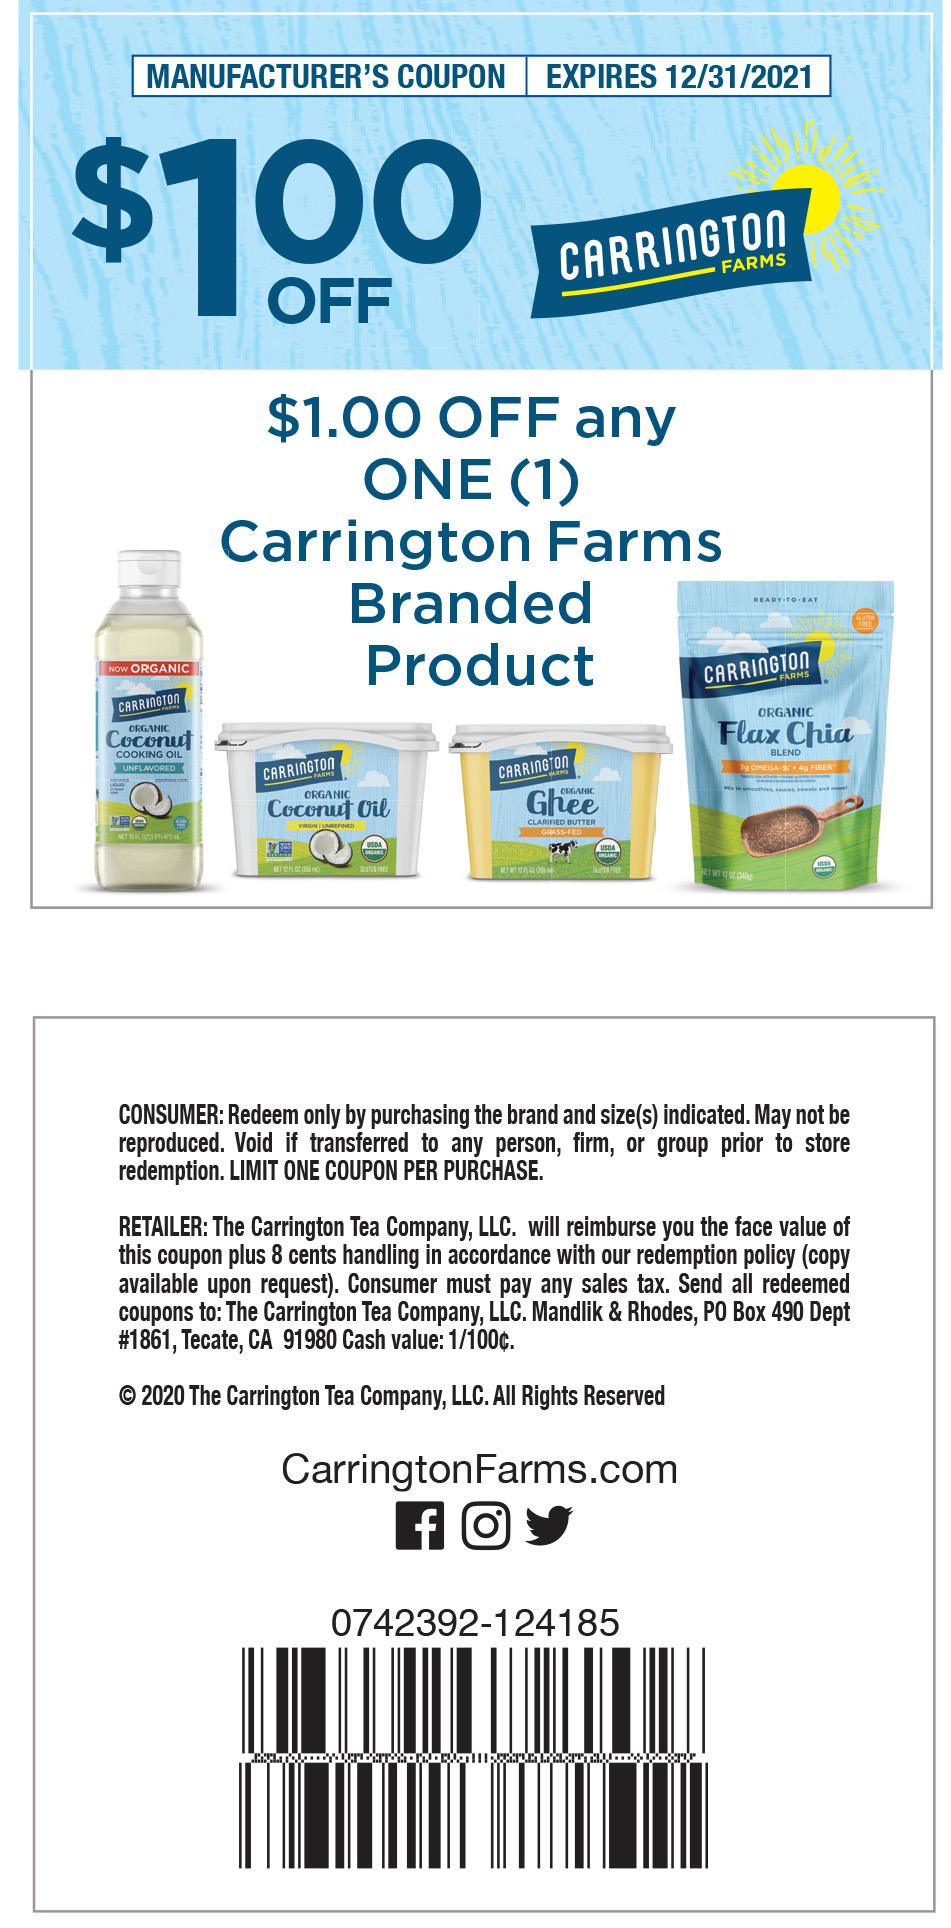 Carrington Farms In Store 2021 Coupon